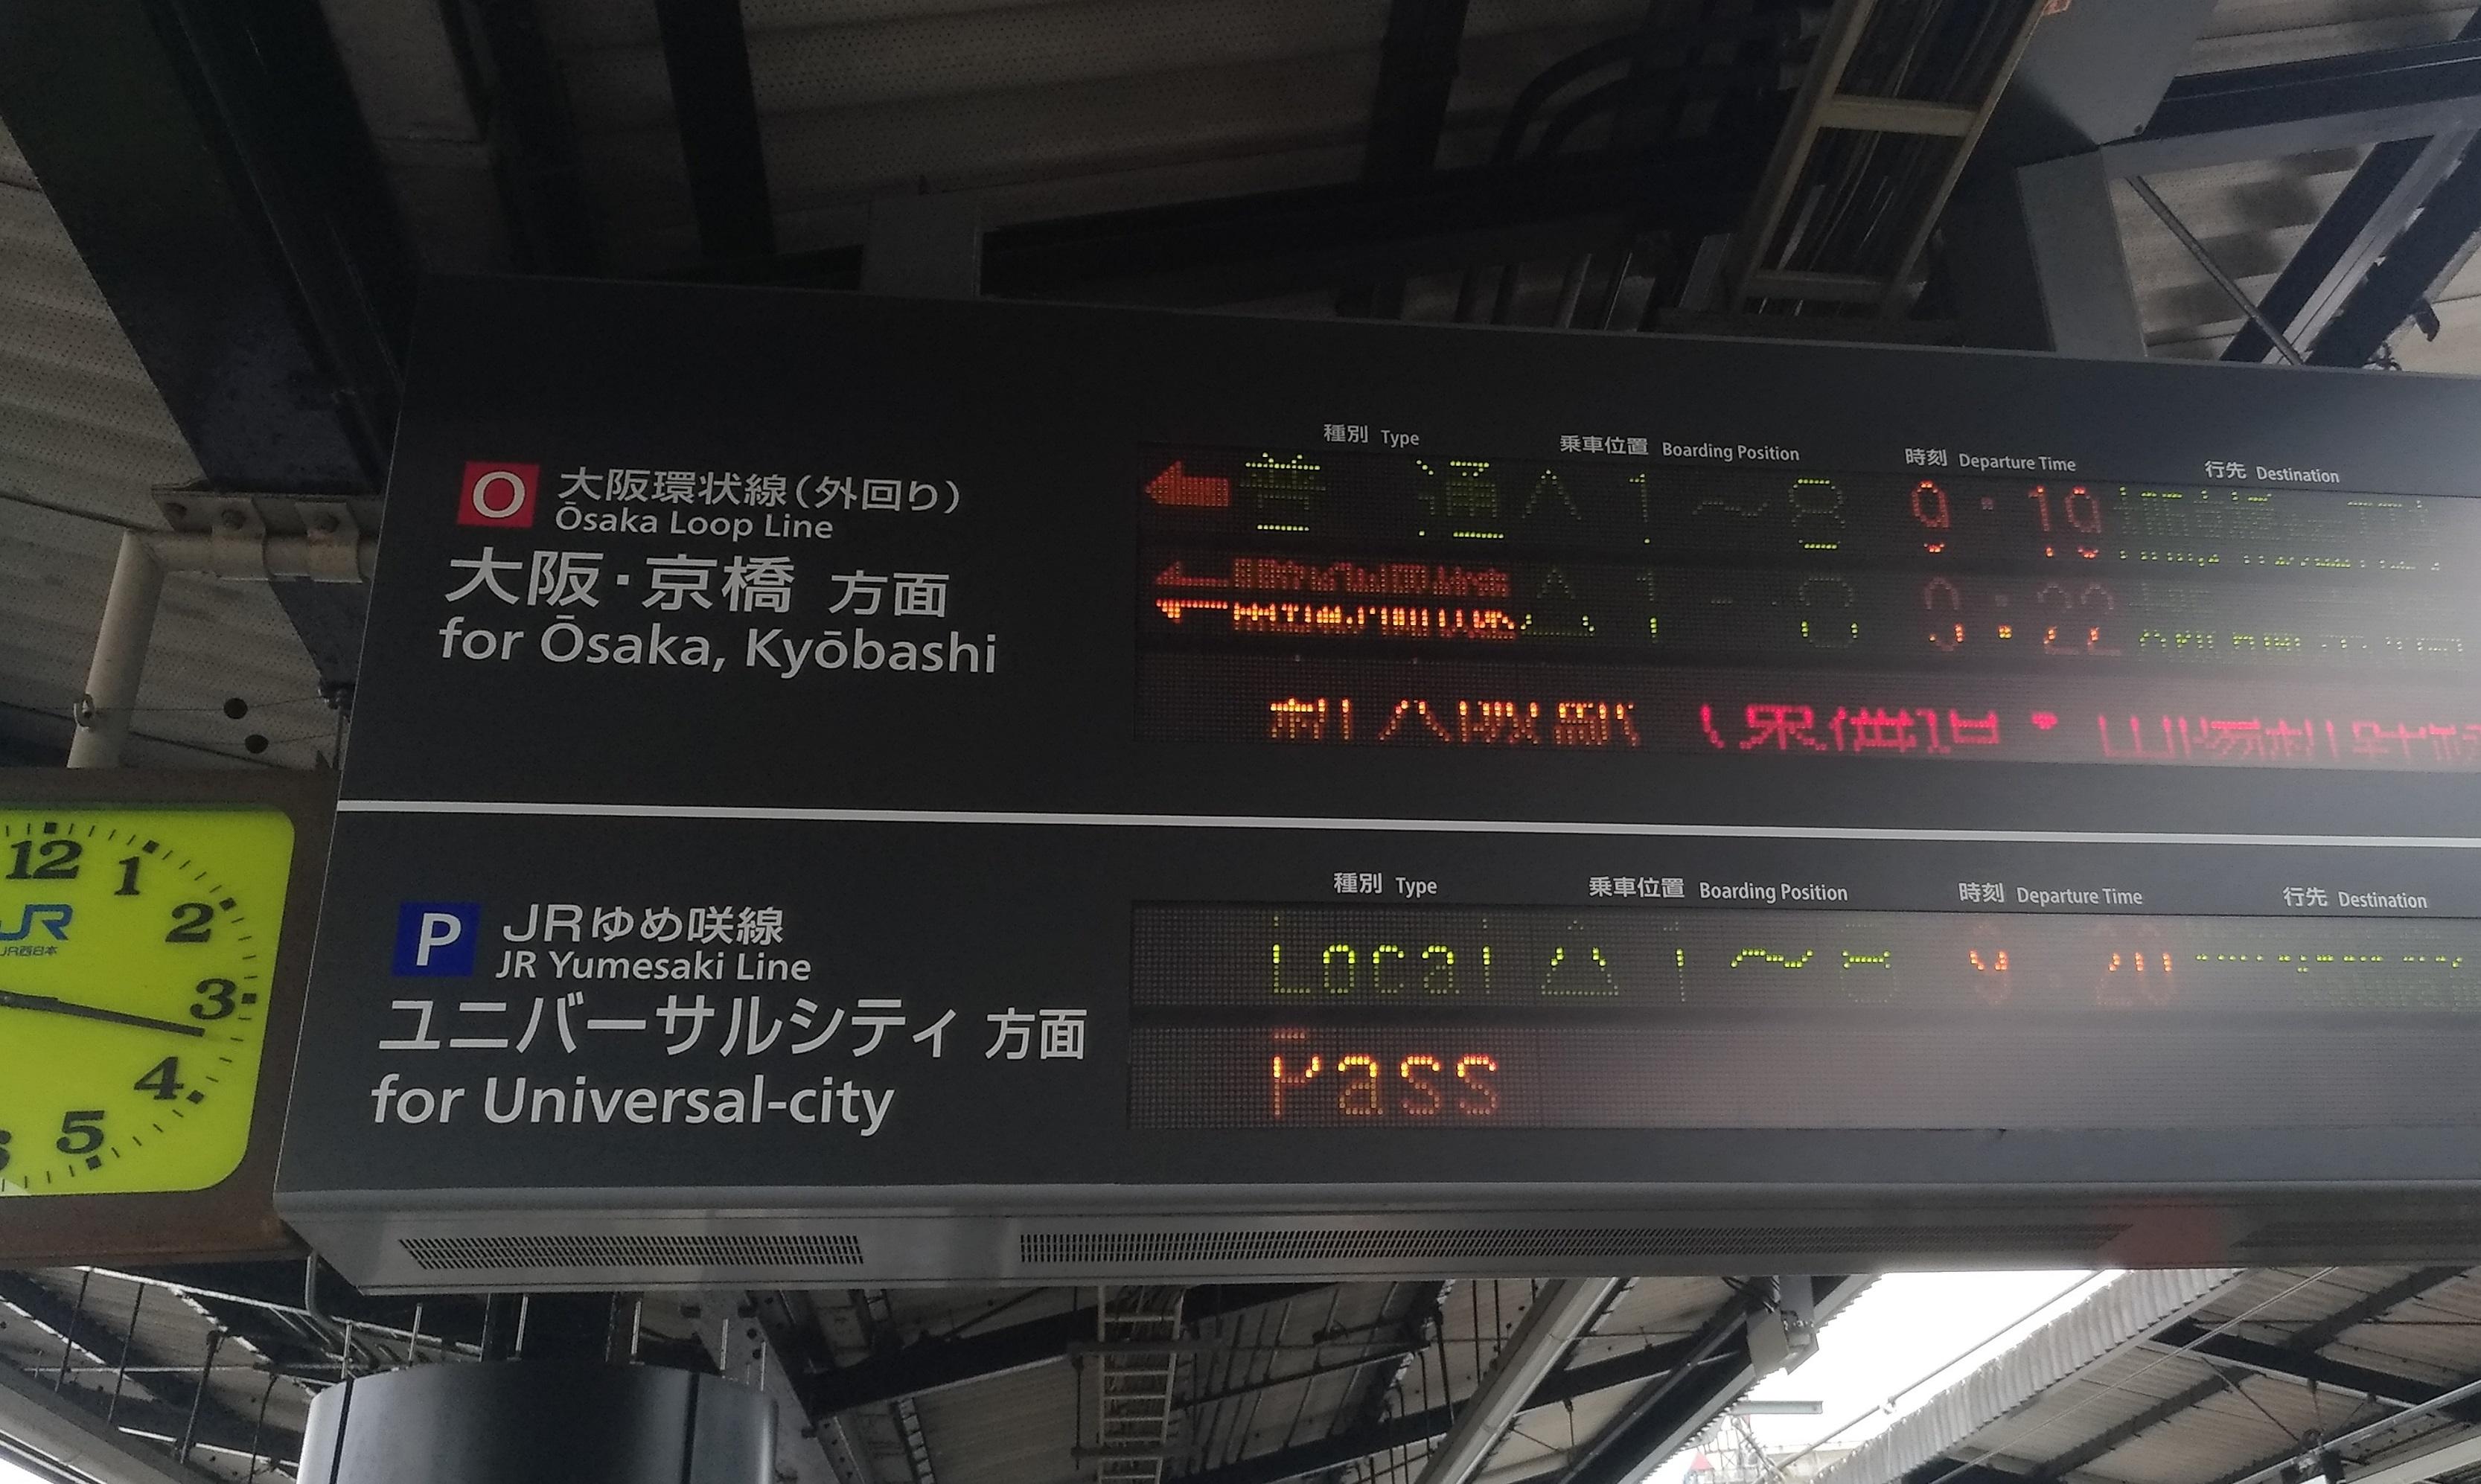 osaka_train_usj_1.jpg